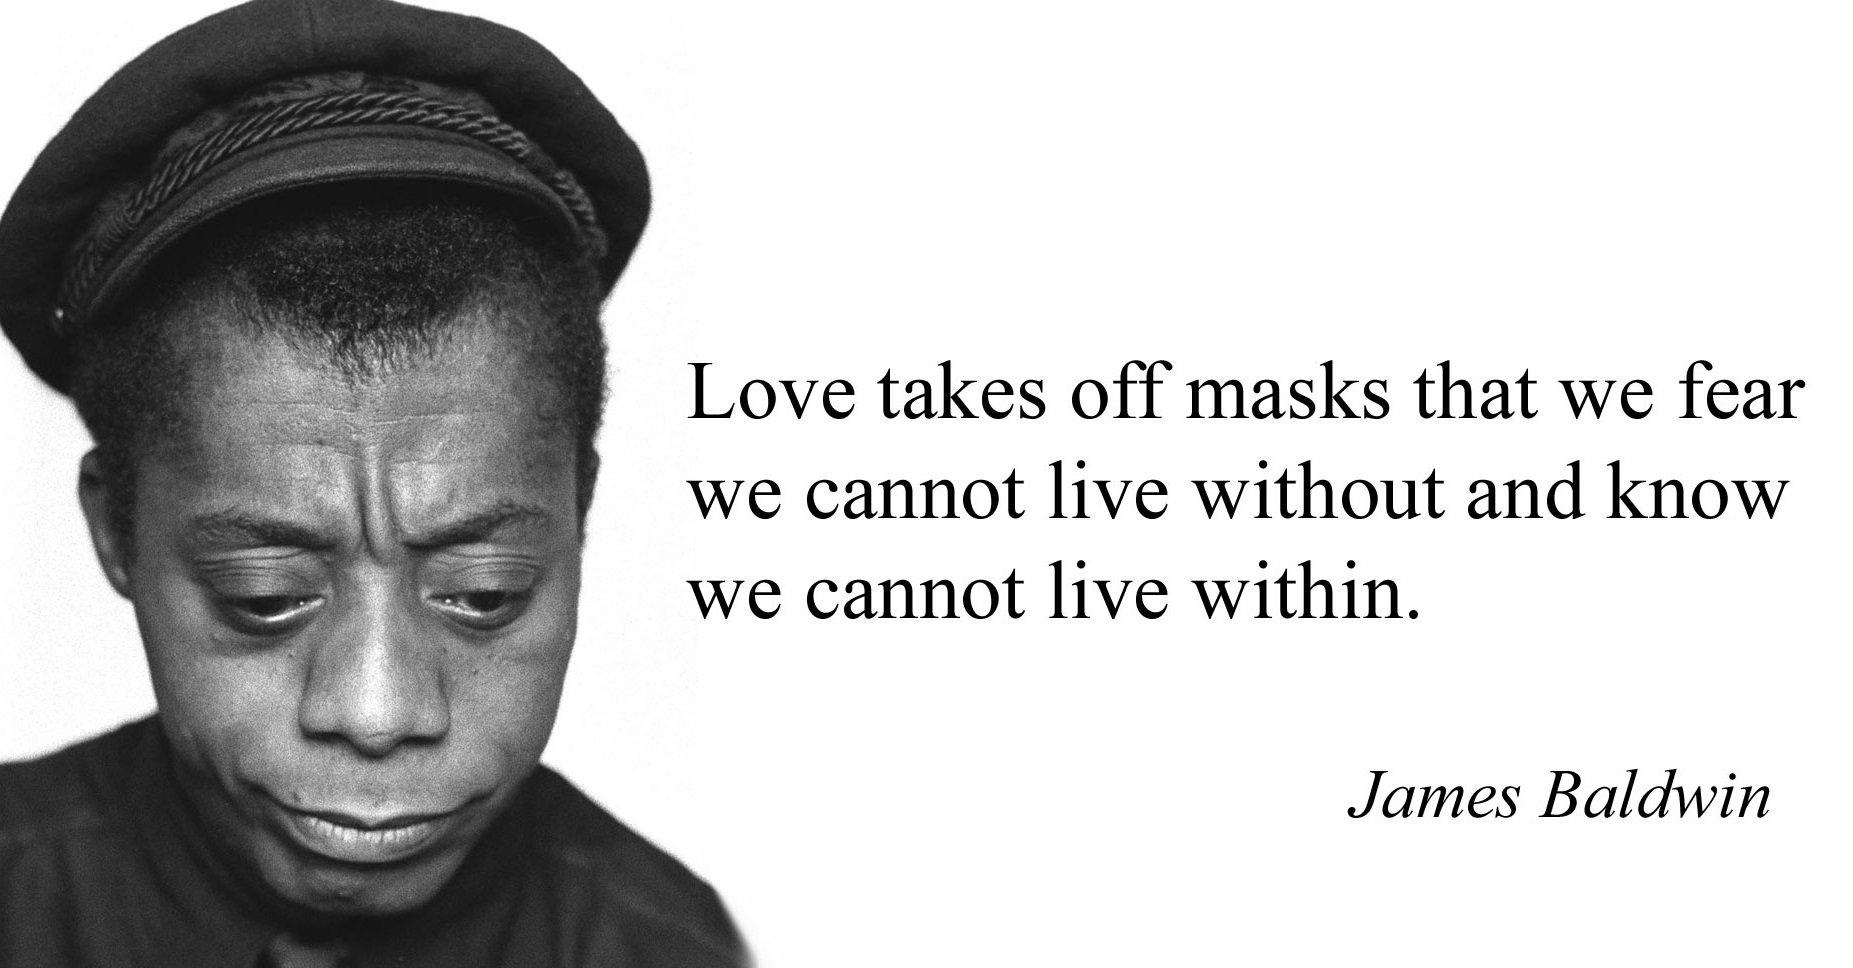 James Baldwin on Masks